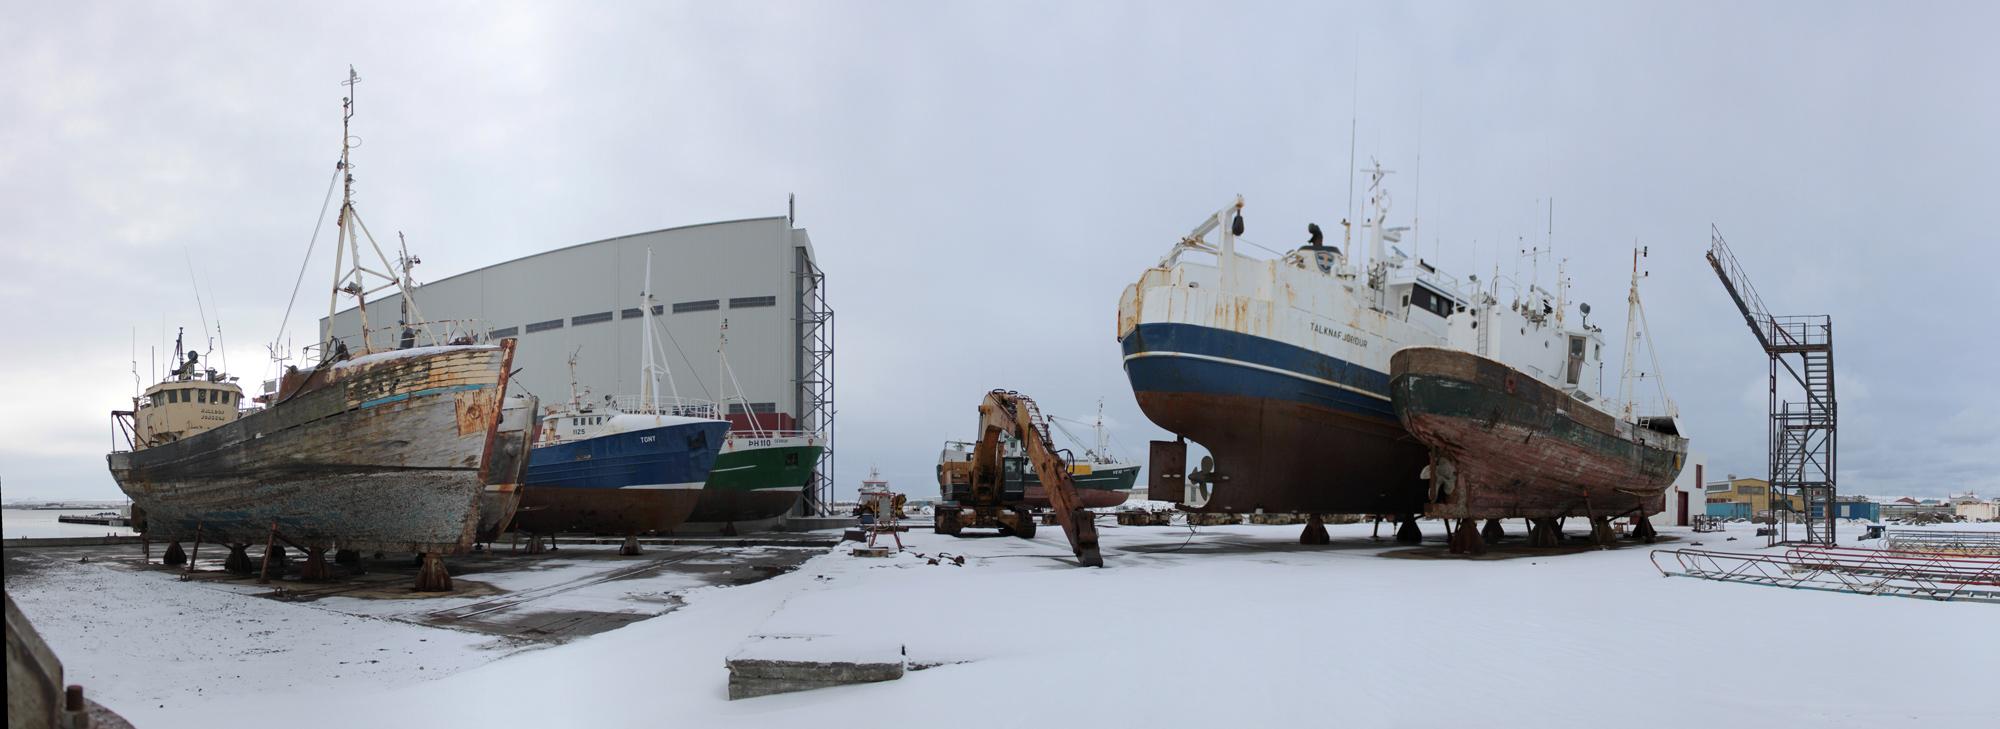 keflavik-ship-pano-2